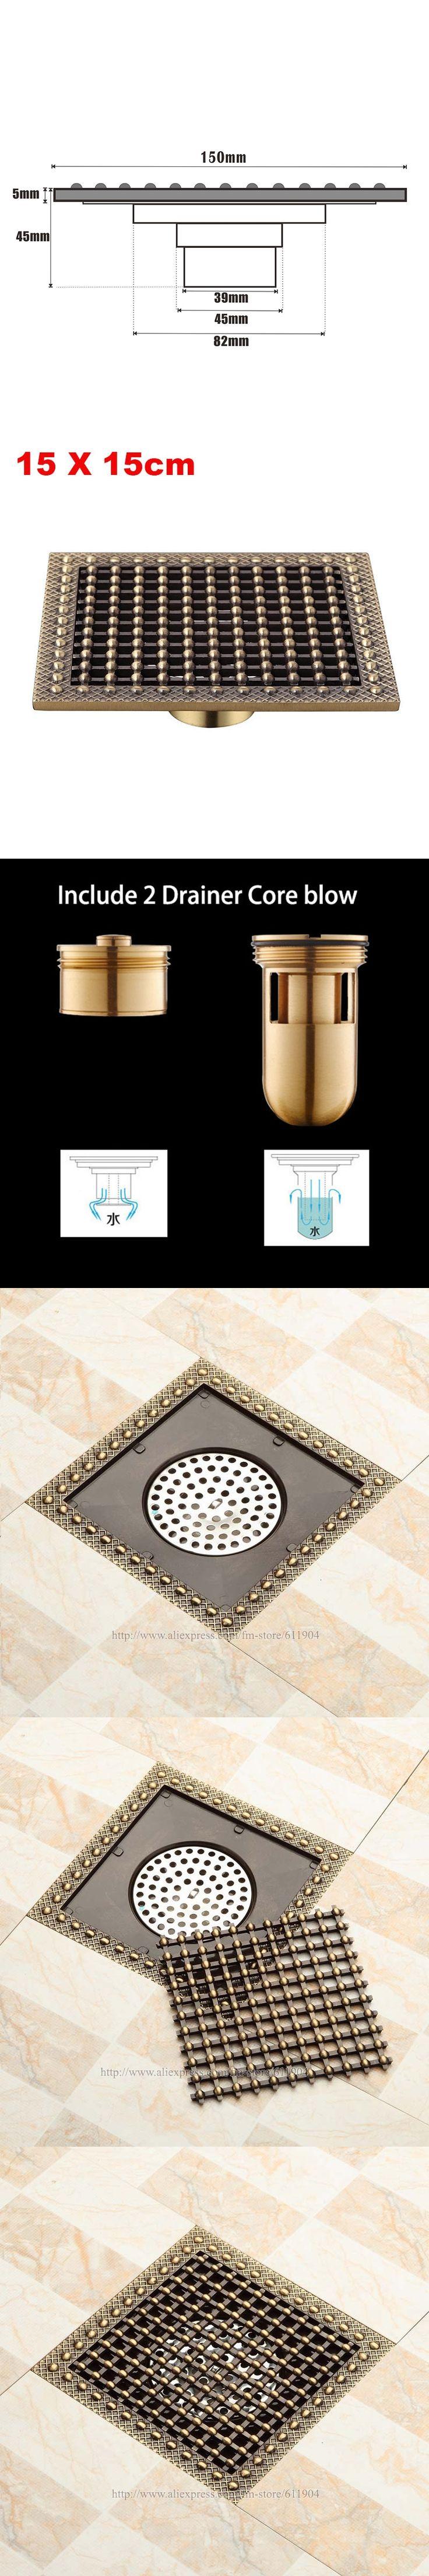 15 x 15 Square Bathroom Shower Drain Floor Drain Trap Waste Grate Antique Brass Grid Drain